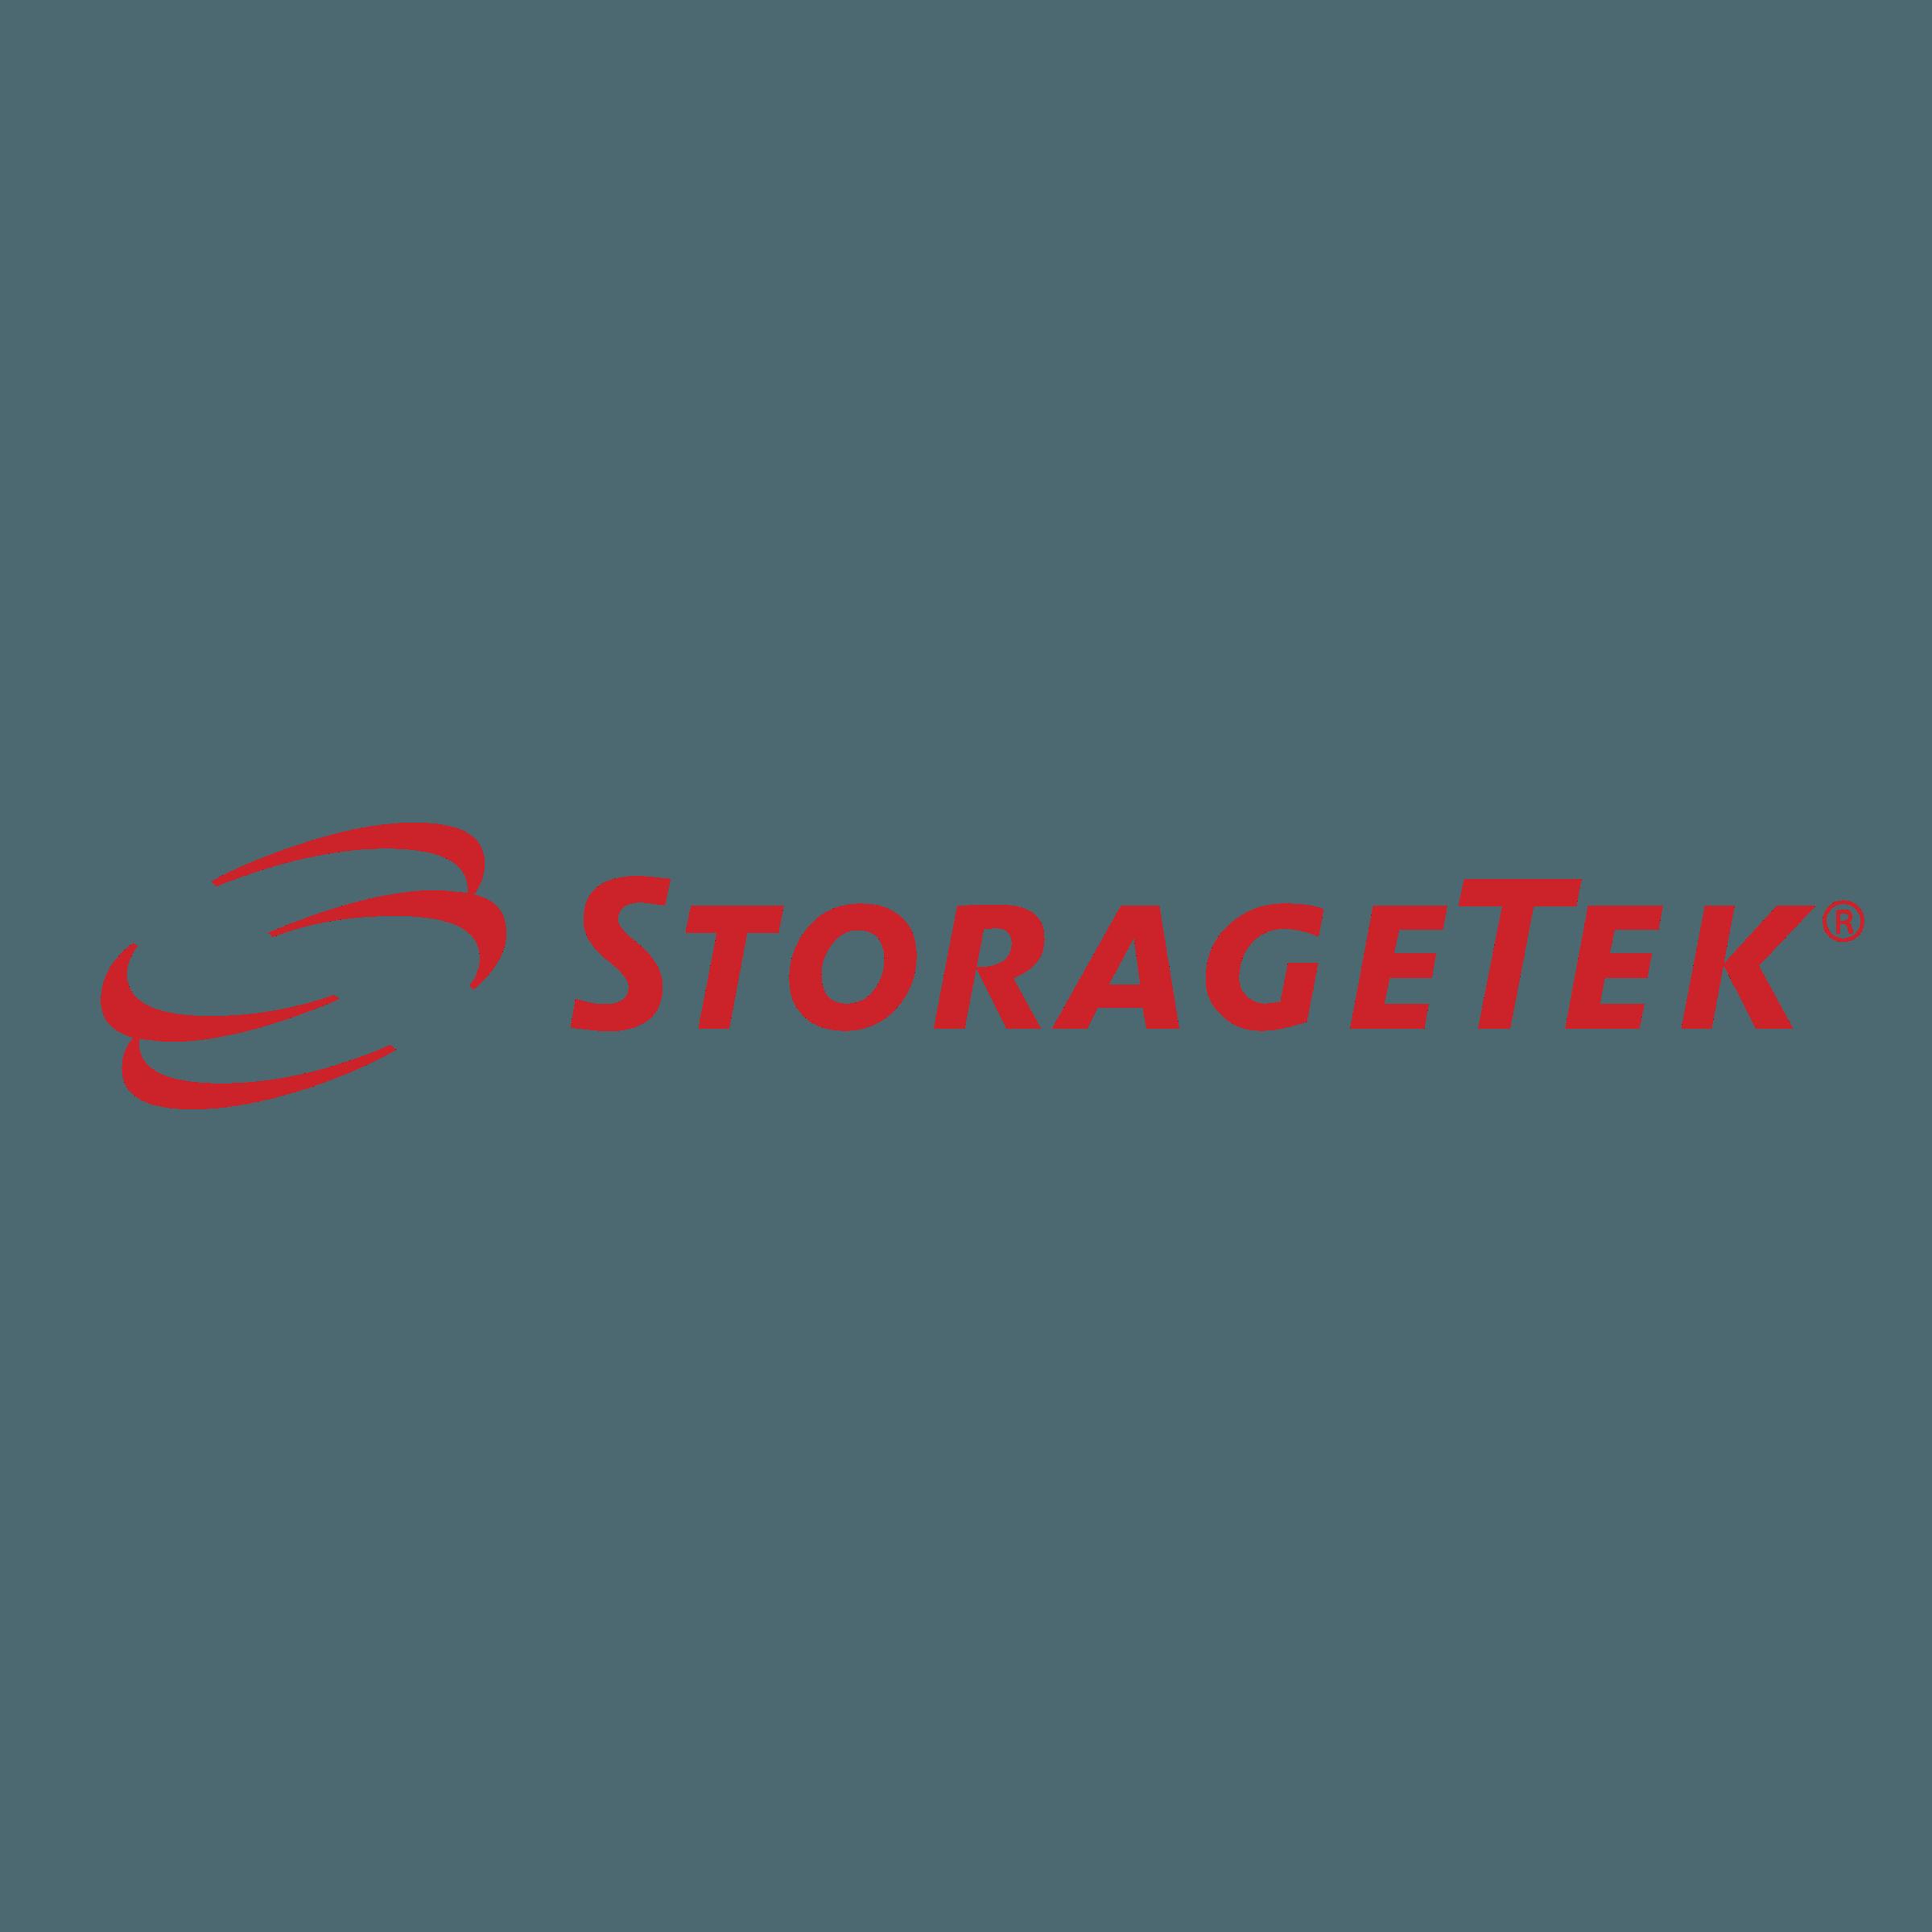 Mantenimiento StorageTek